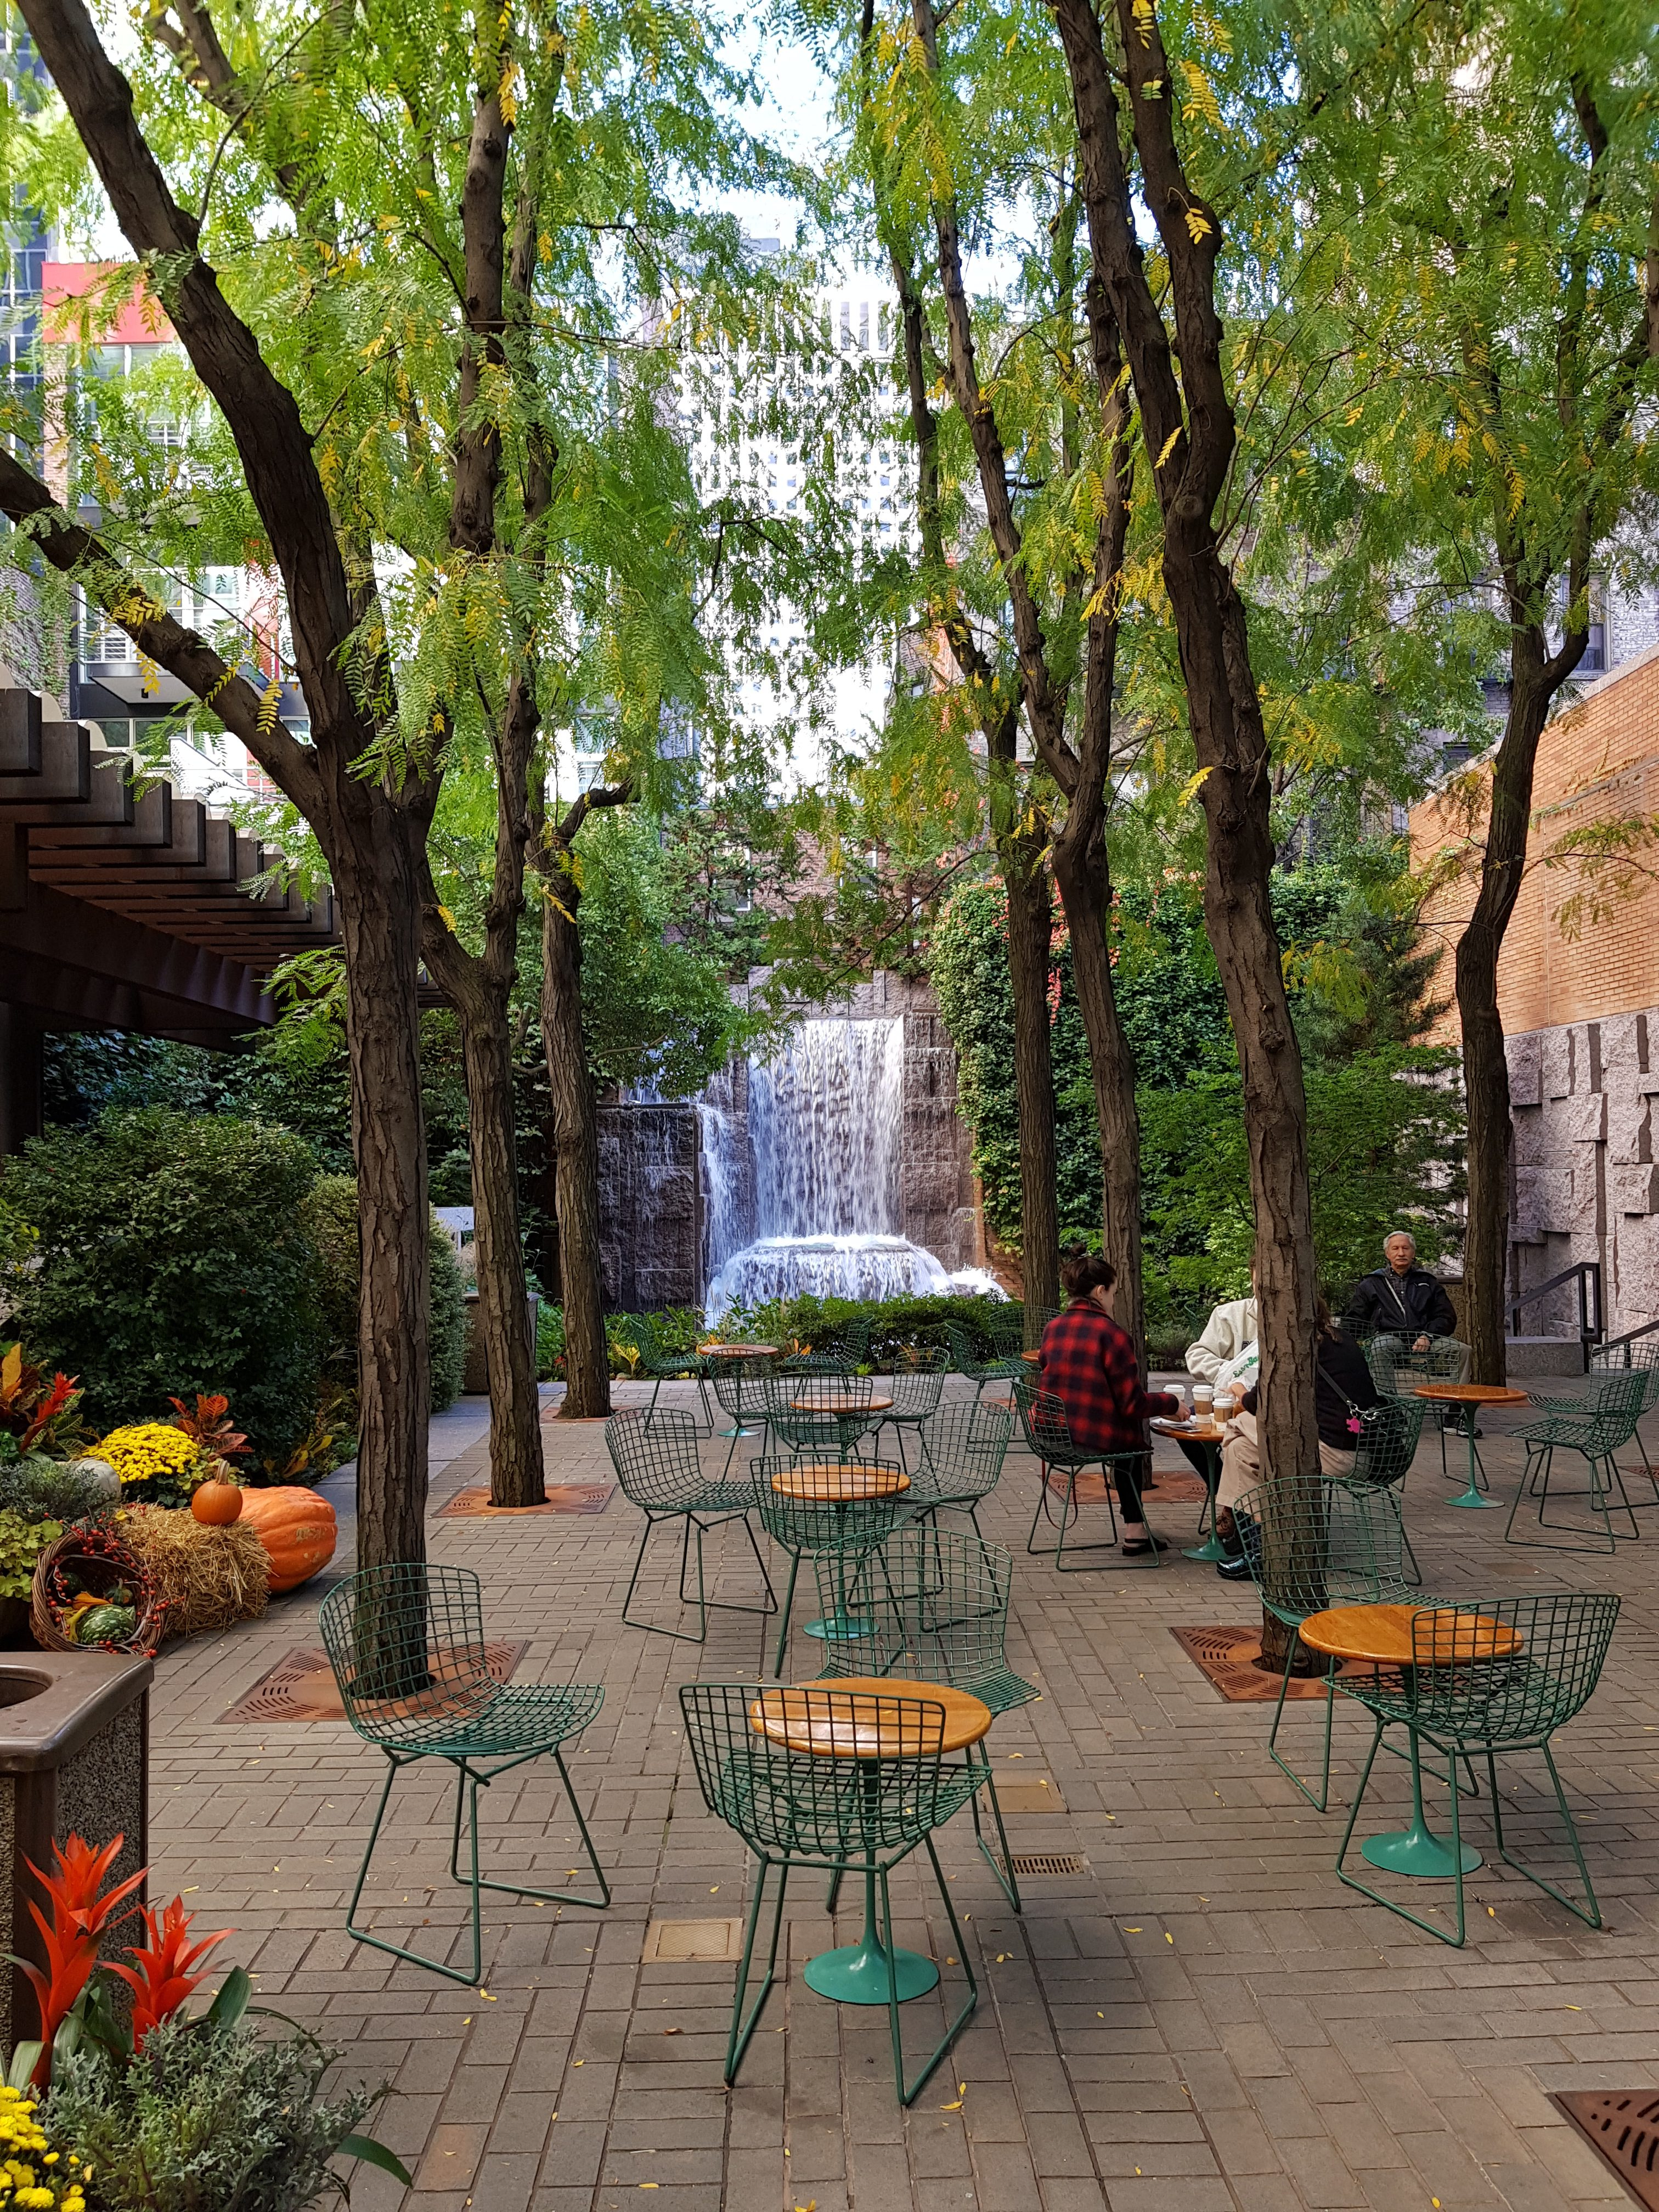 New York - Greenacre Park